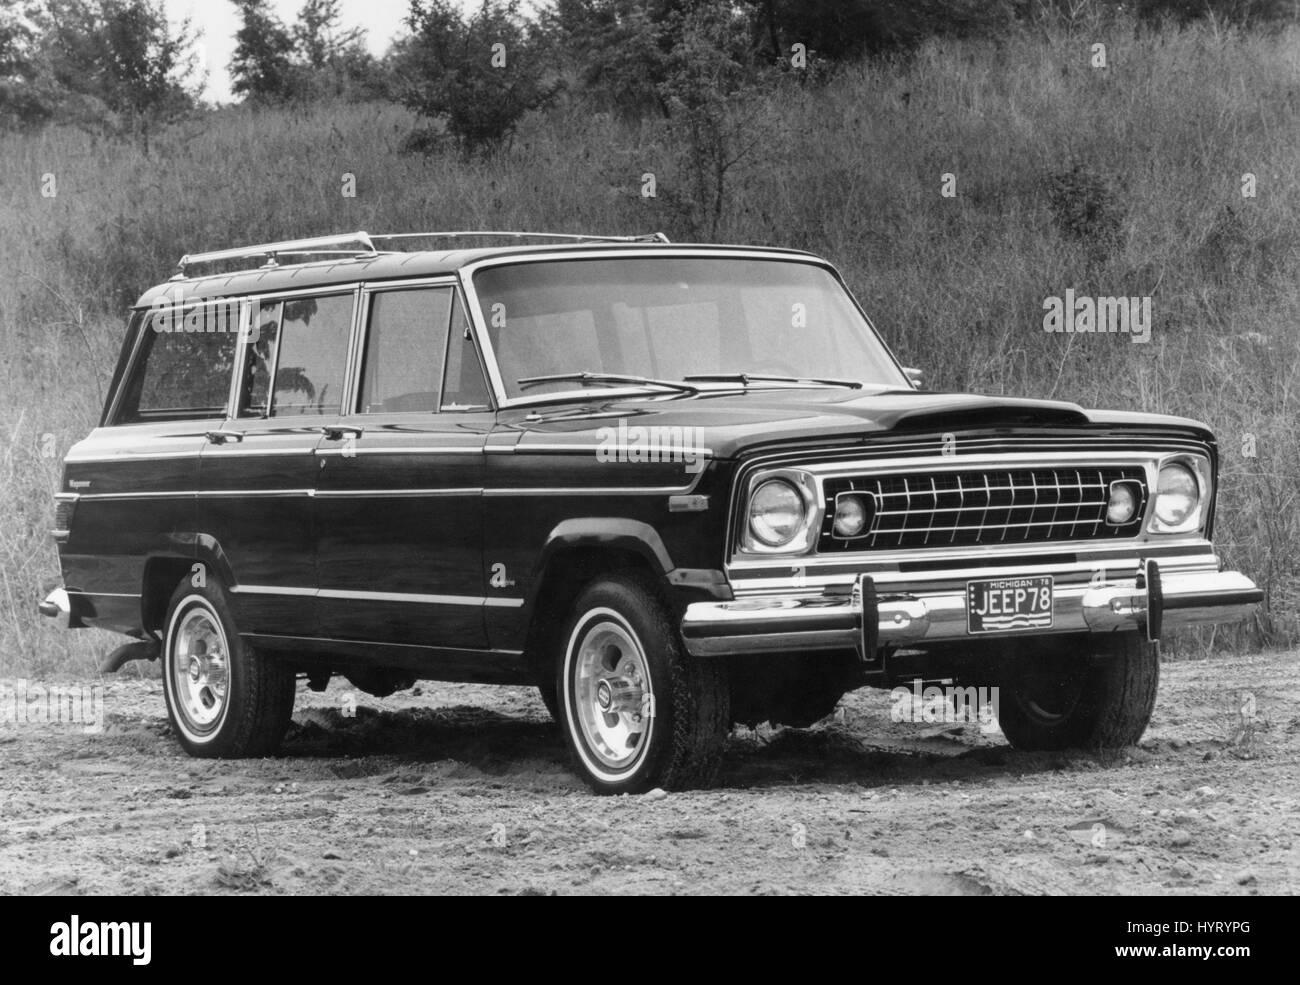 1978 Jeep Wagoneer - Stock Image